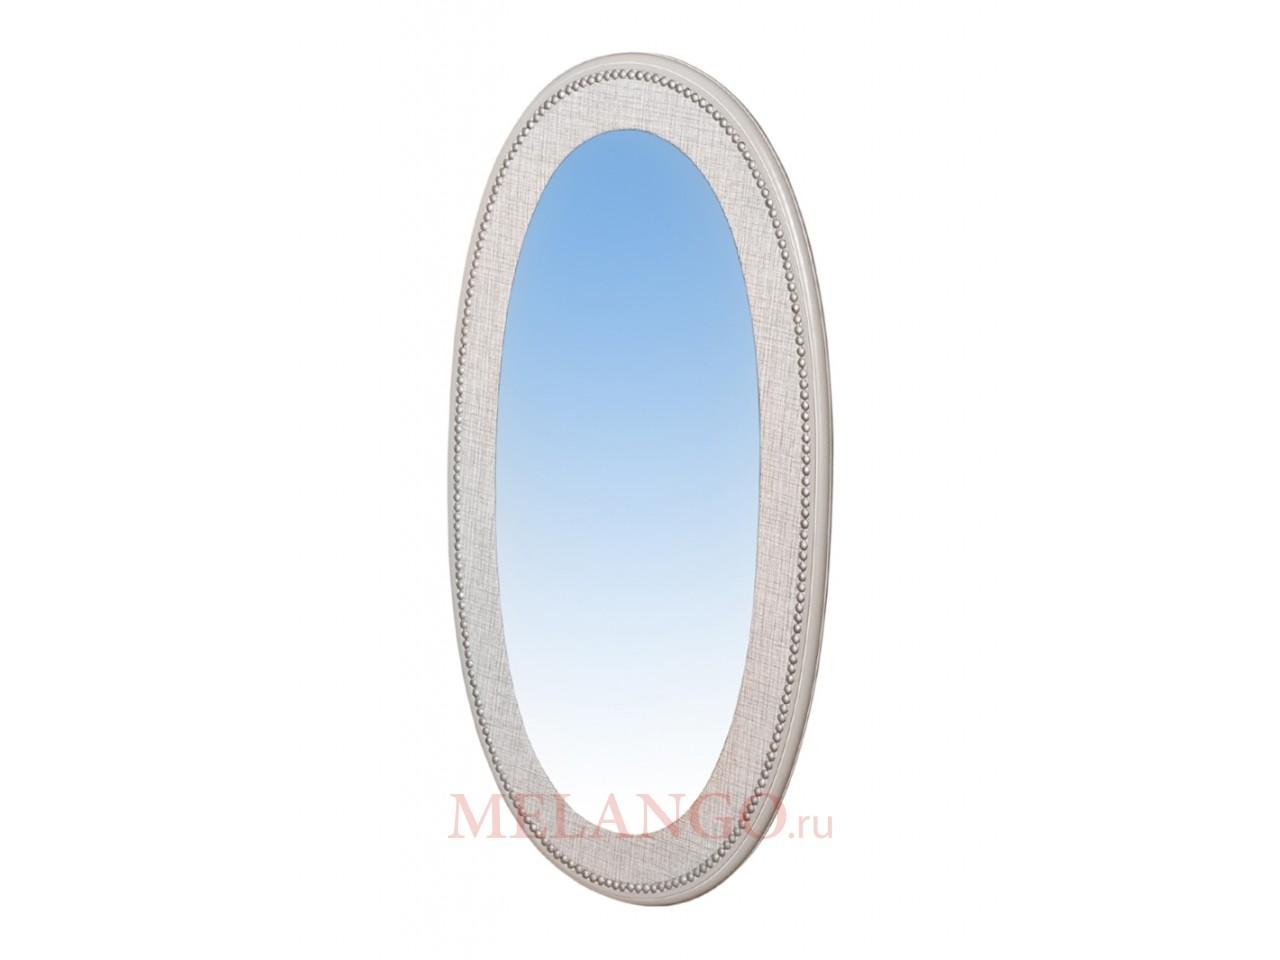 Зеркало Шевалье-3